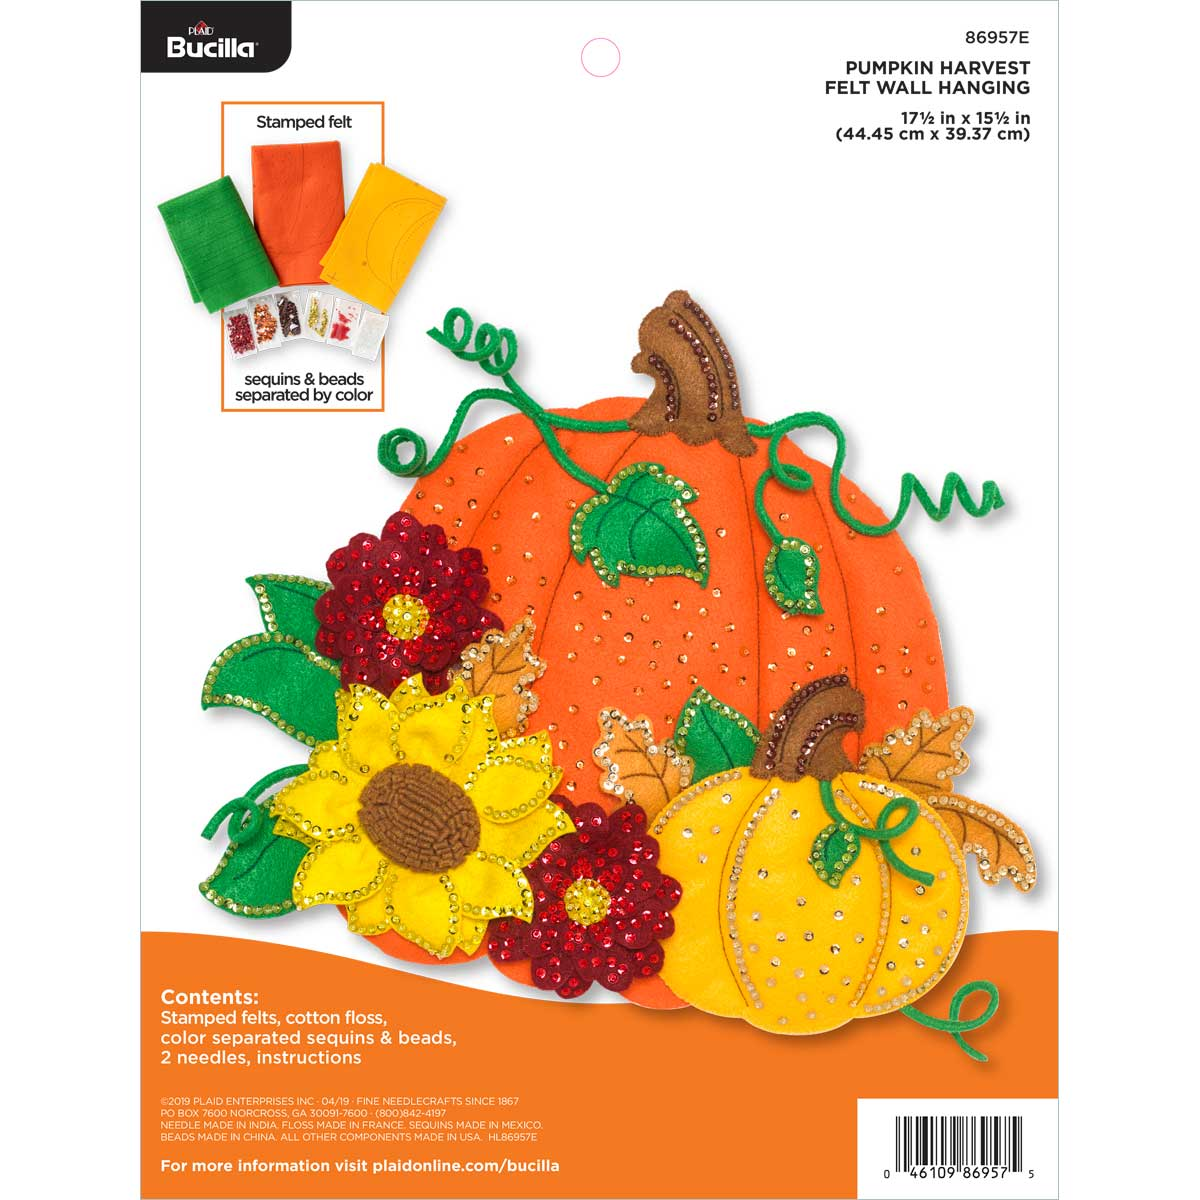 Bucilla ® Seasonal - Felt - Home Decor - Door/Wall Hanging Kits - Pumpkin Harvest